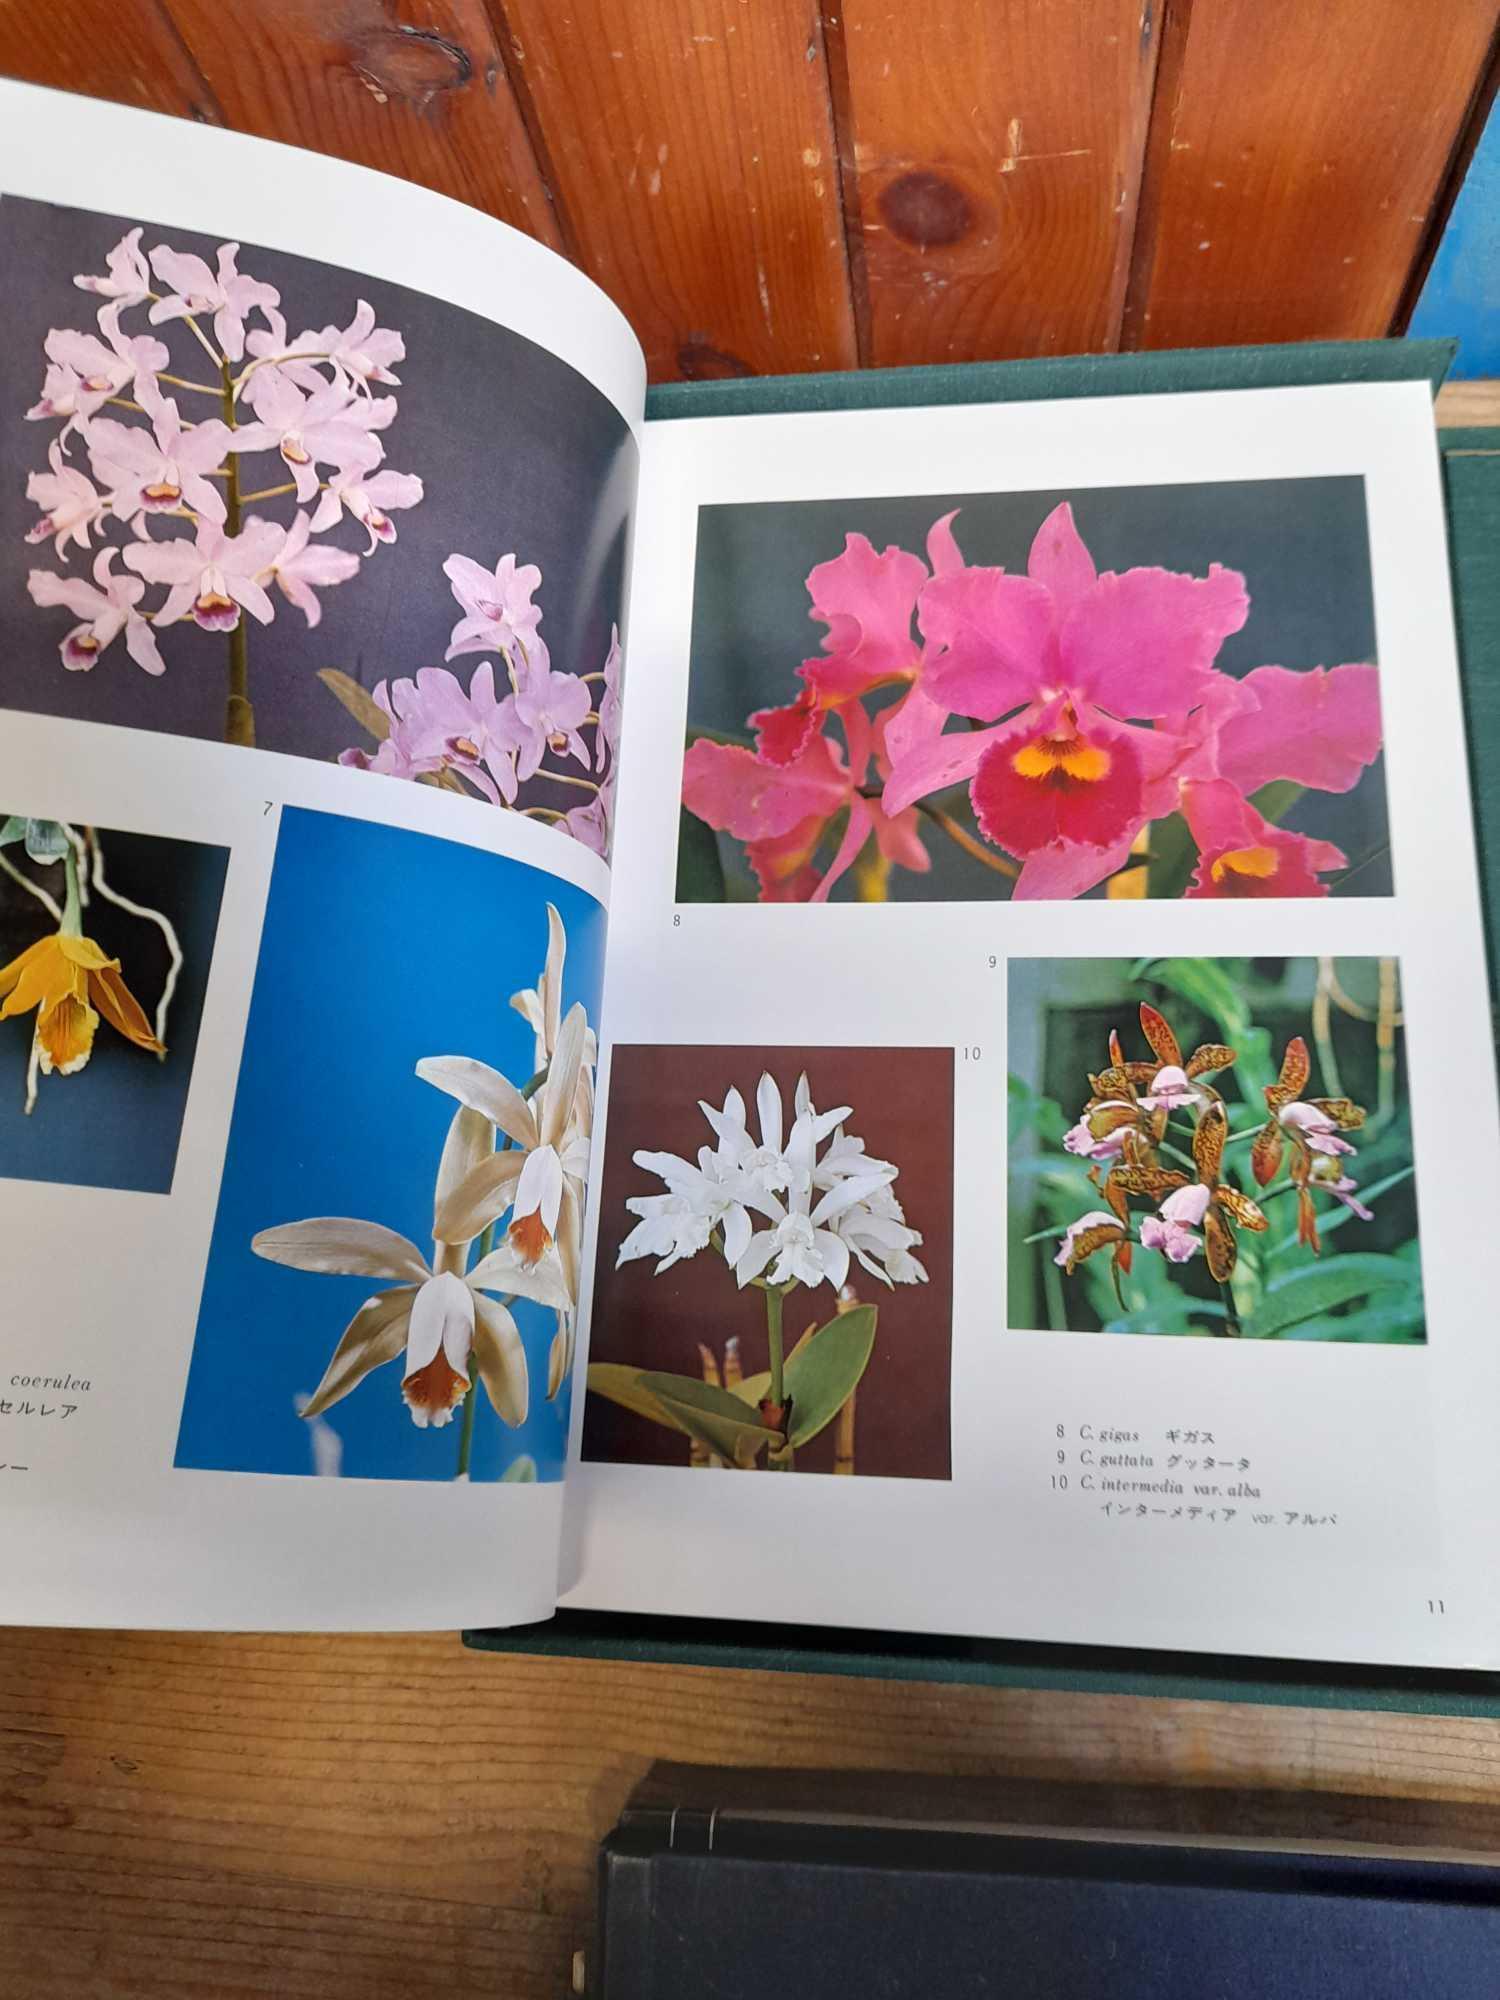 2 ORIENTAL BOOKS - Image 5 of 14